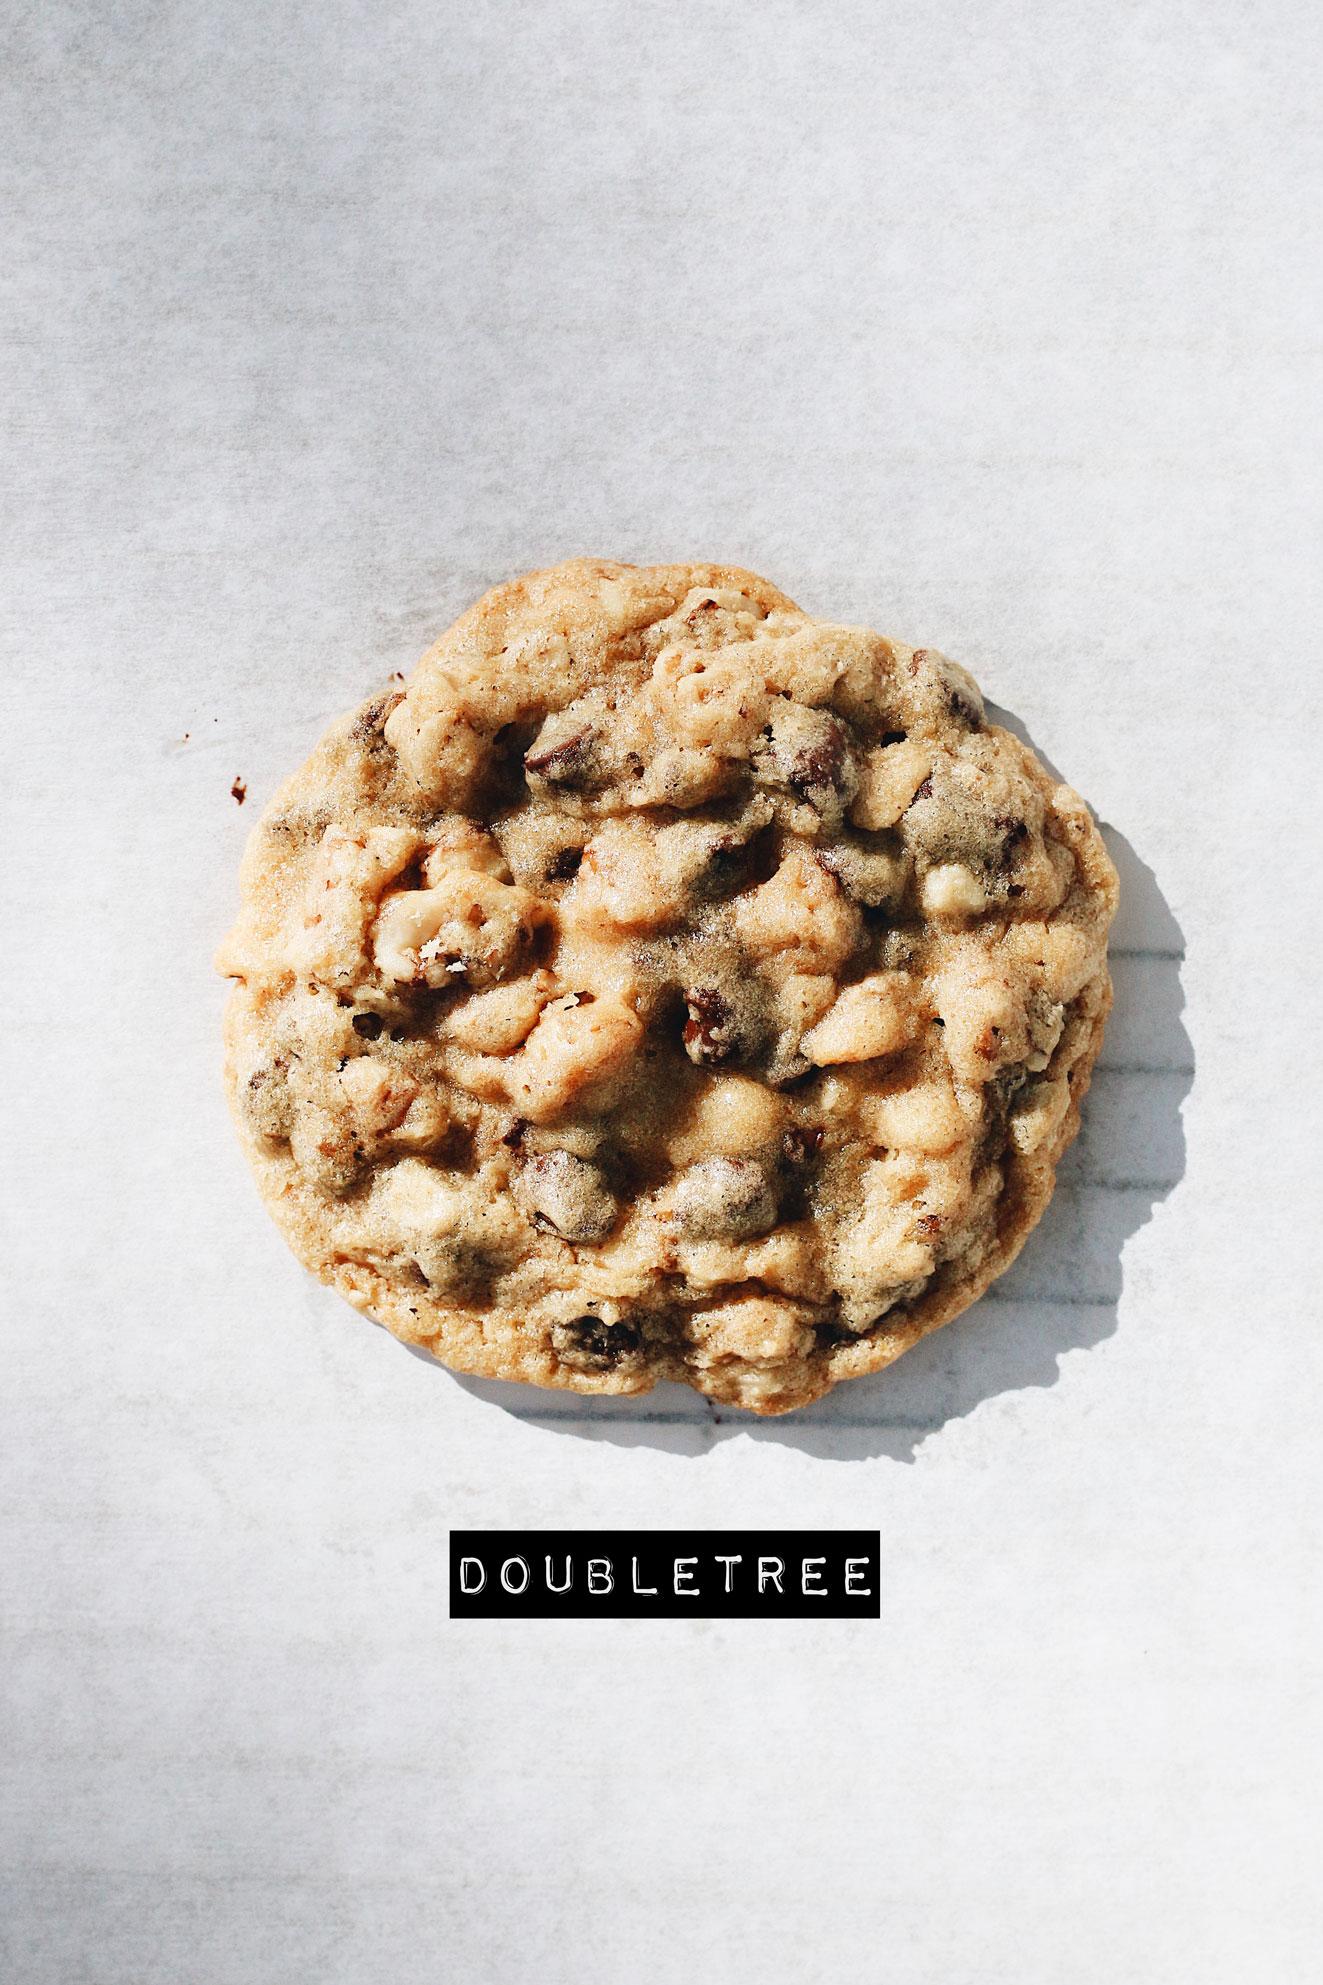 herbakinglab-best-chocolate-chip-cookie-bake-off-doubletree